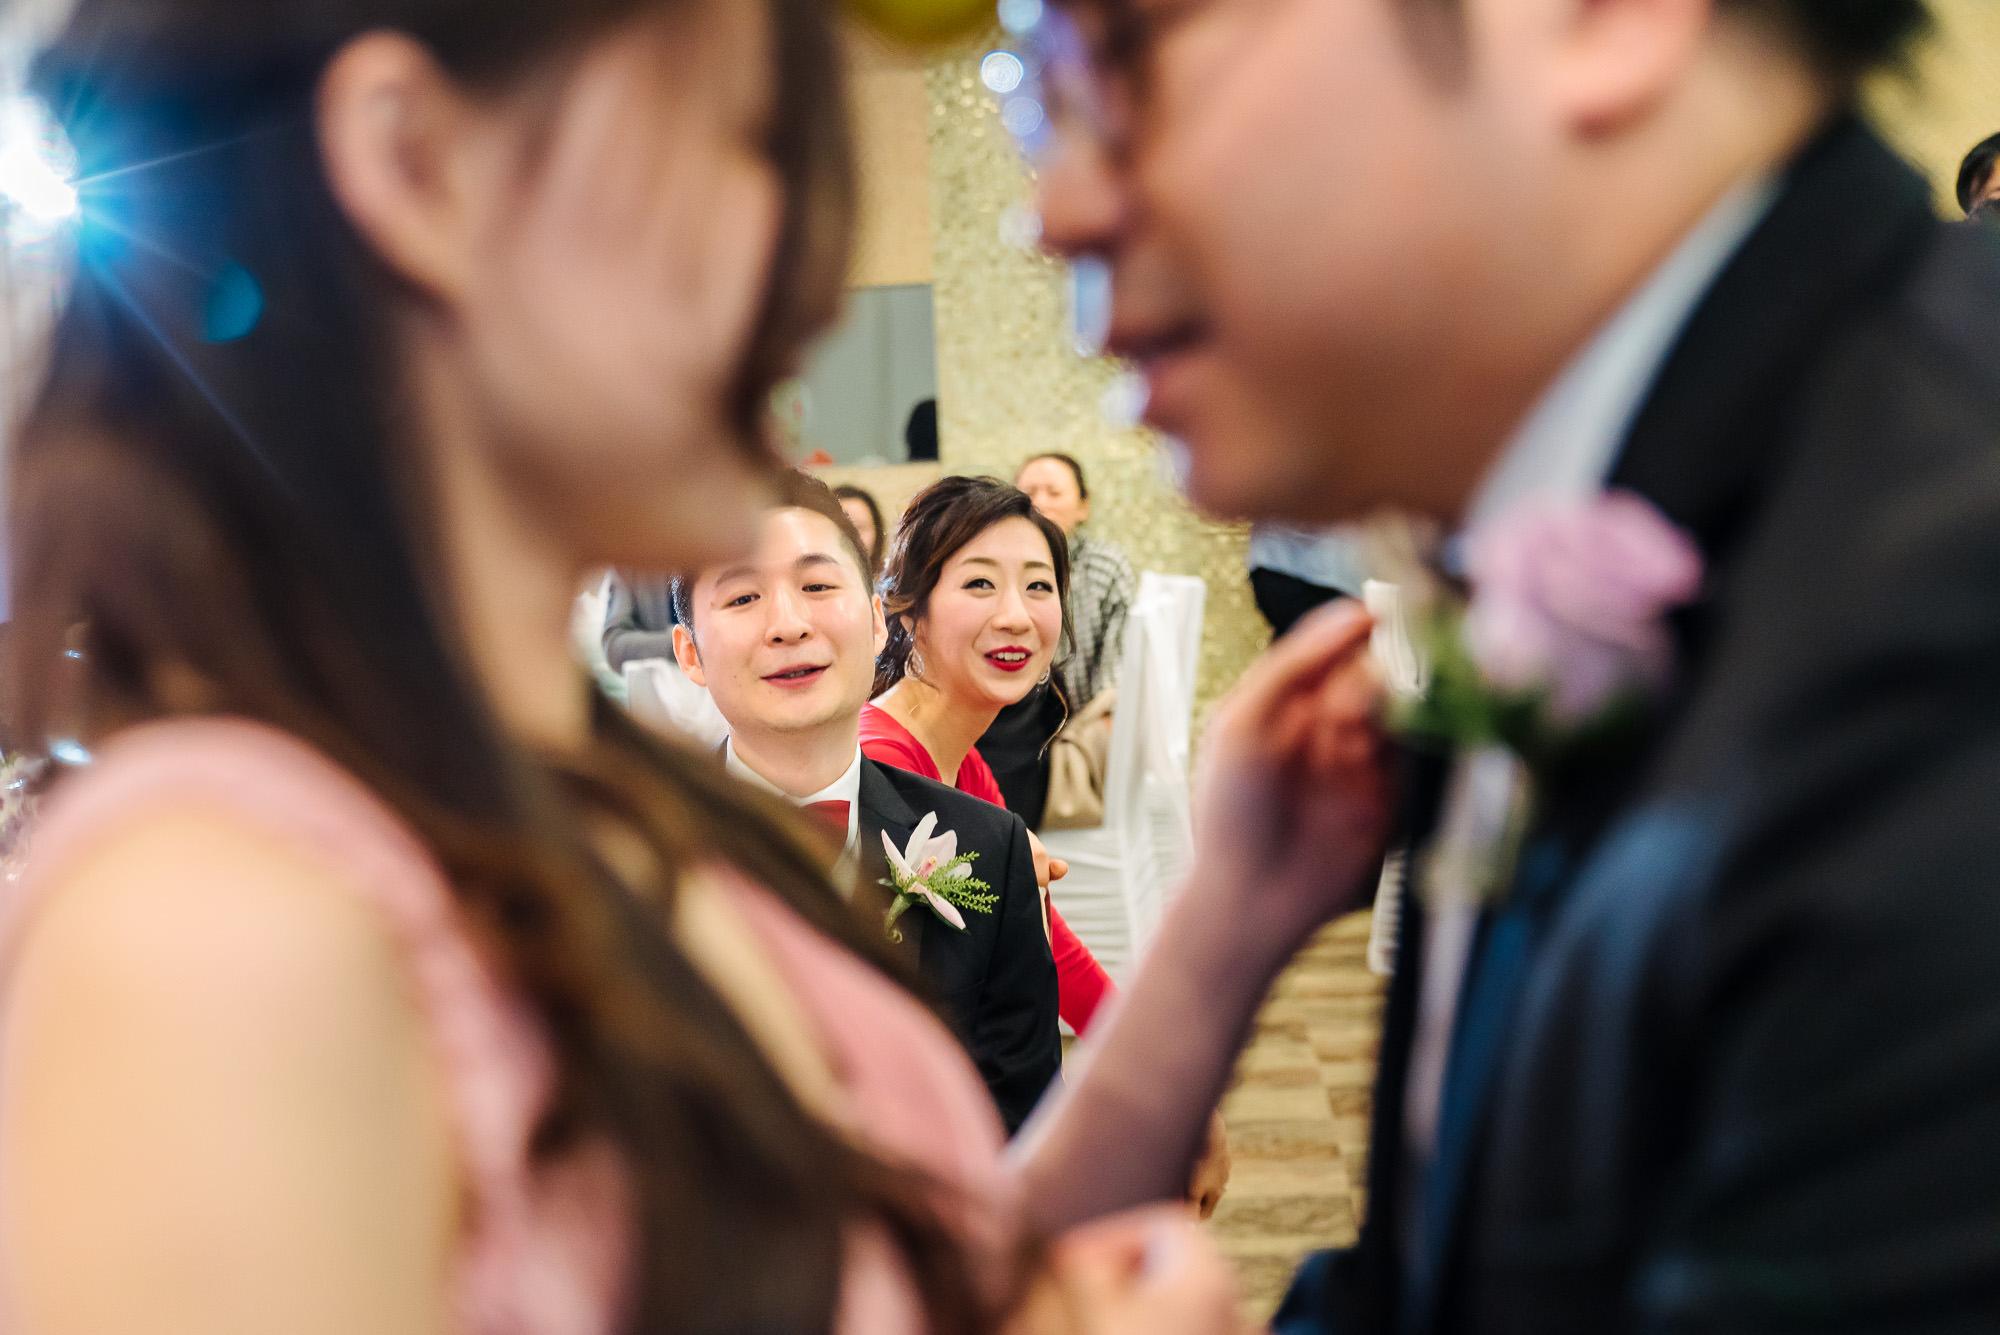 richmond_wedding_reception 21135515.jpg